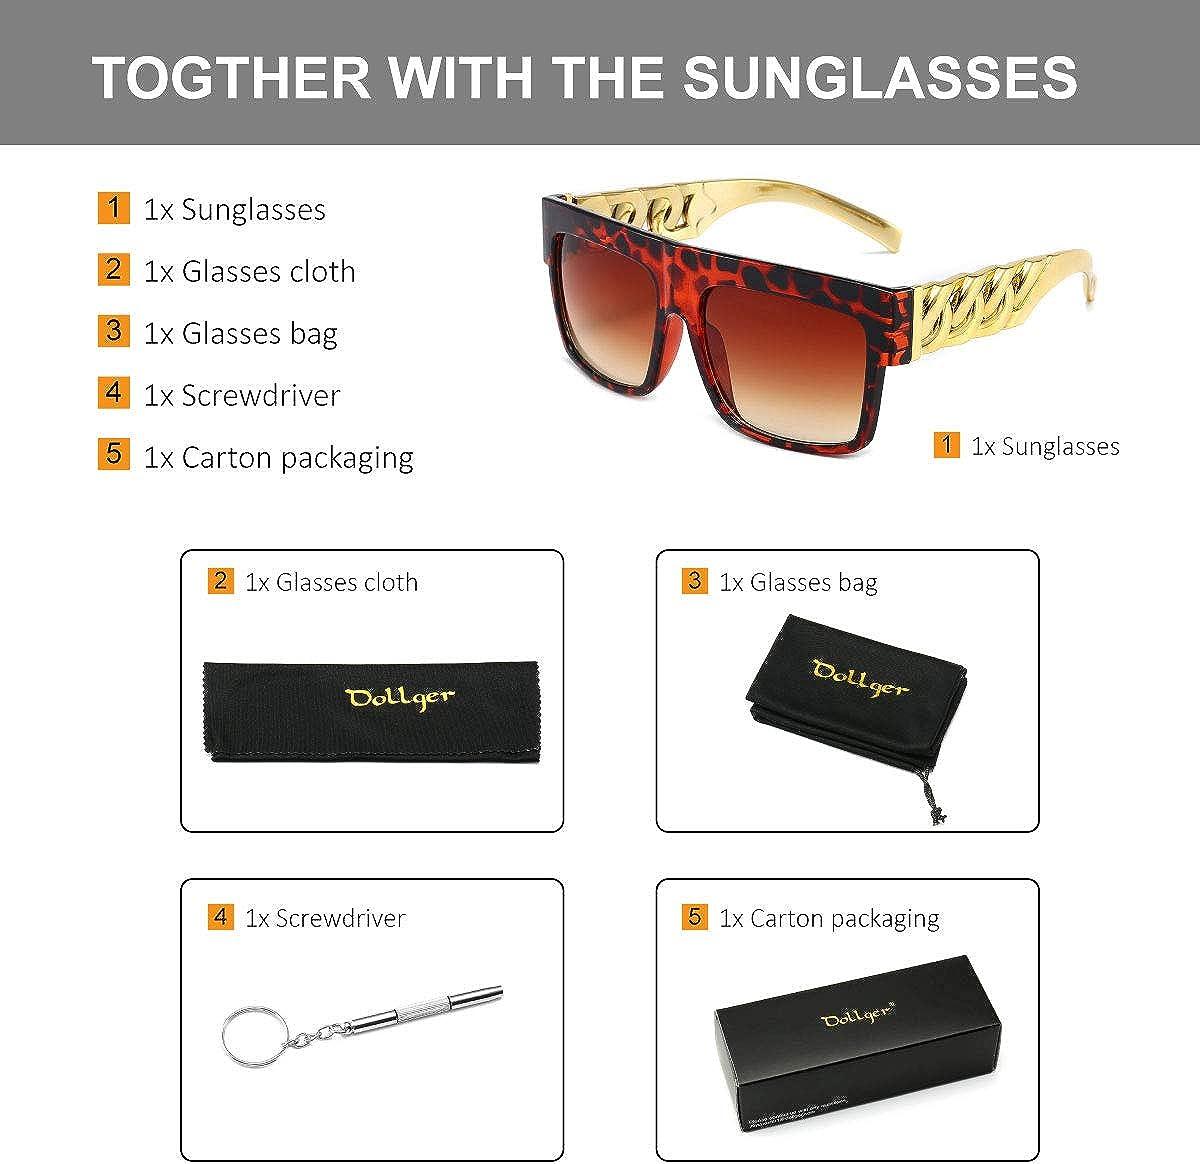 Golden Chain Arm Square Oversized Sunglasses Women Men Hip Hop Luxury Sunglasses